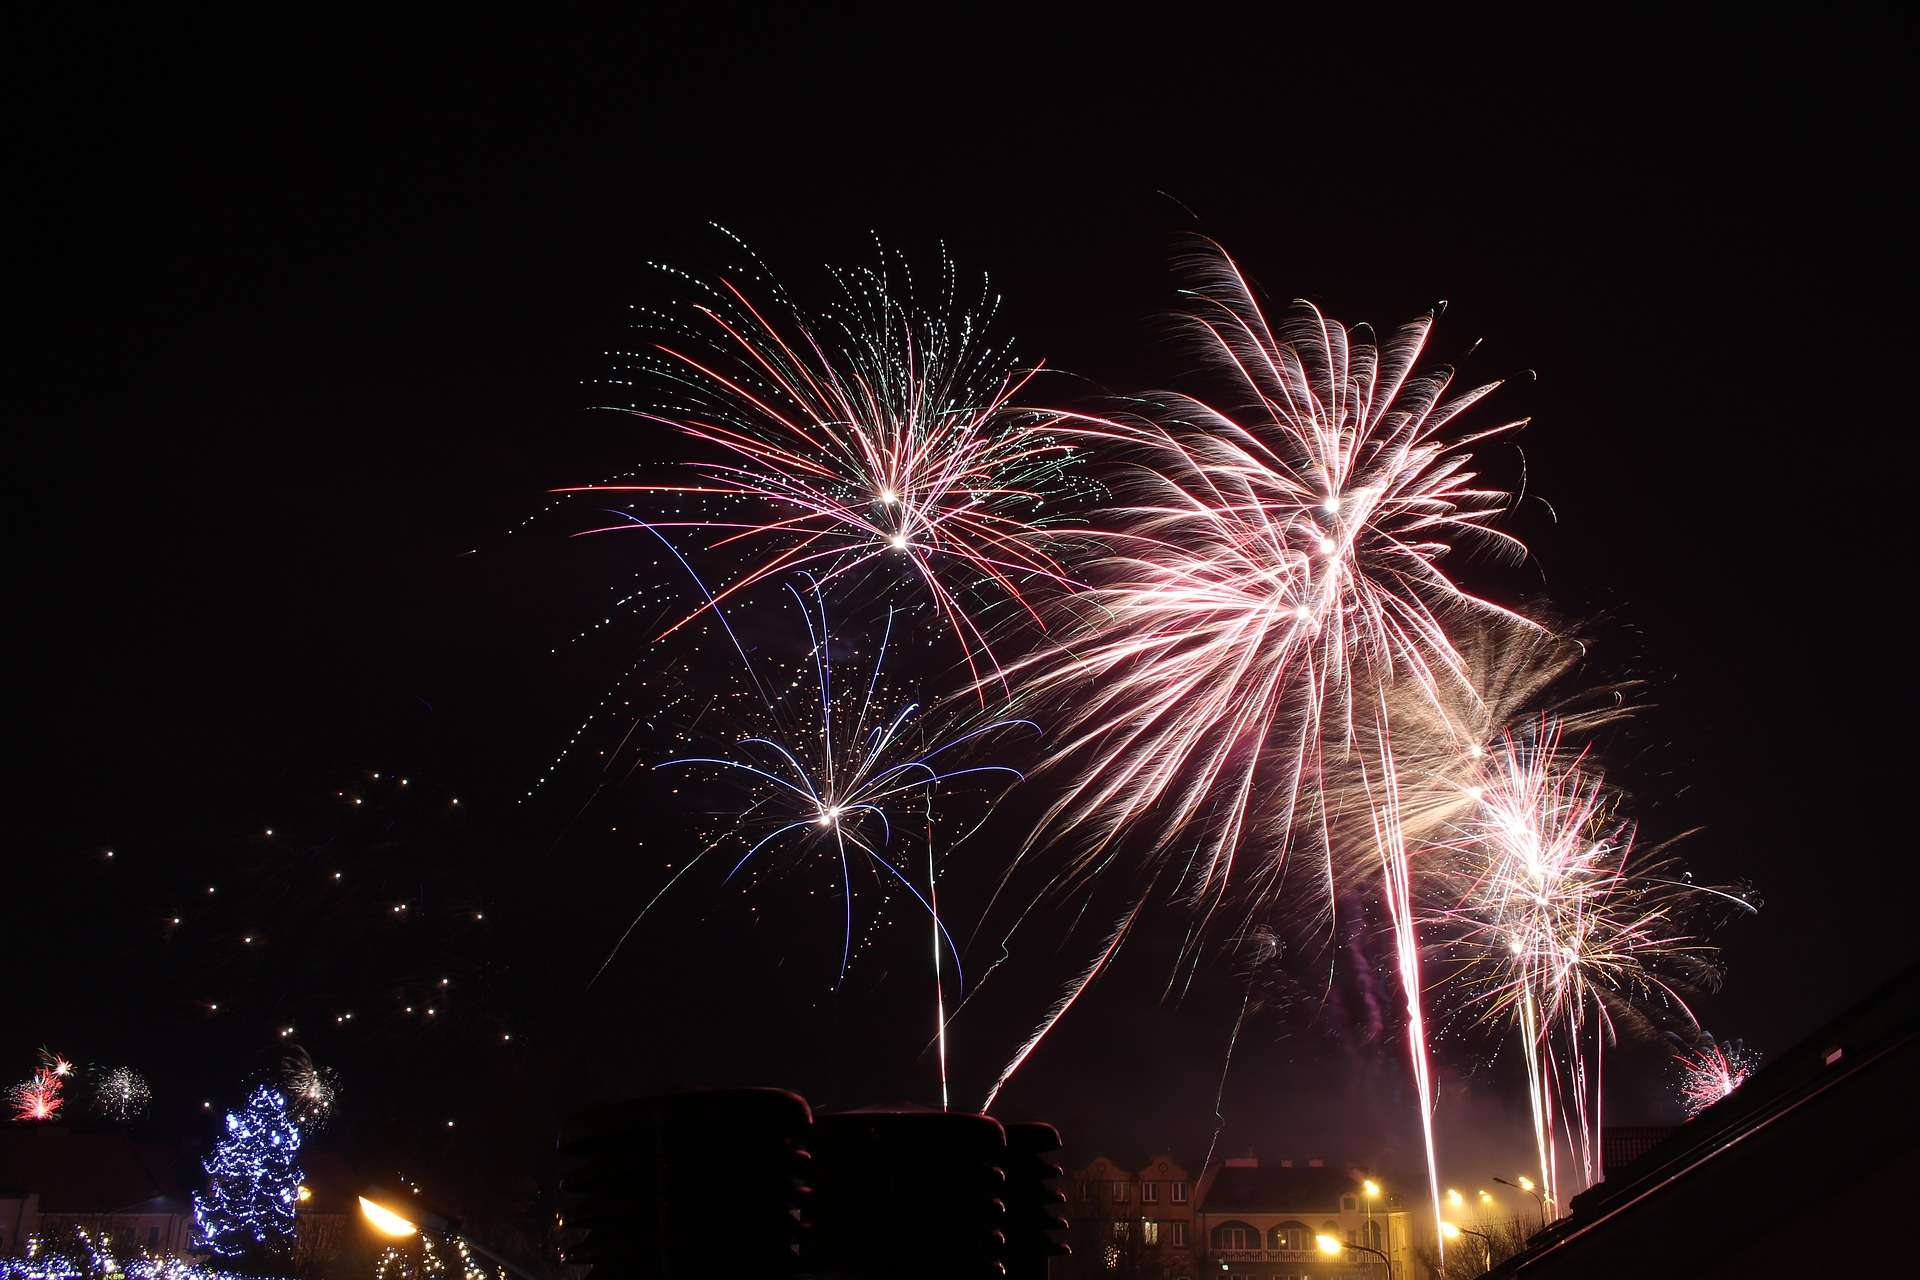 fireworks-2088155_1920